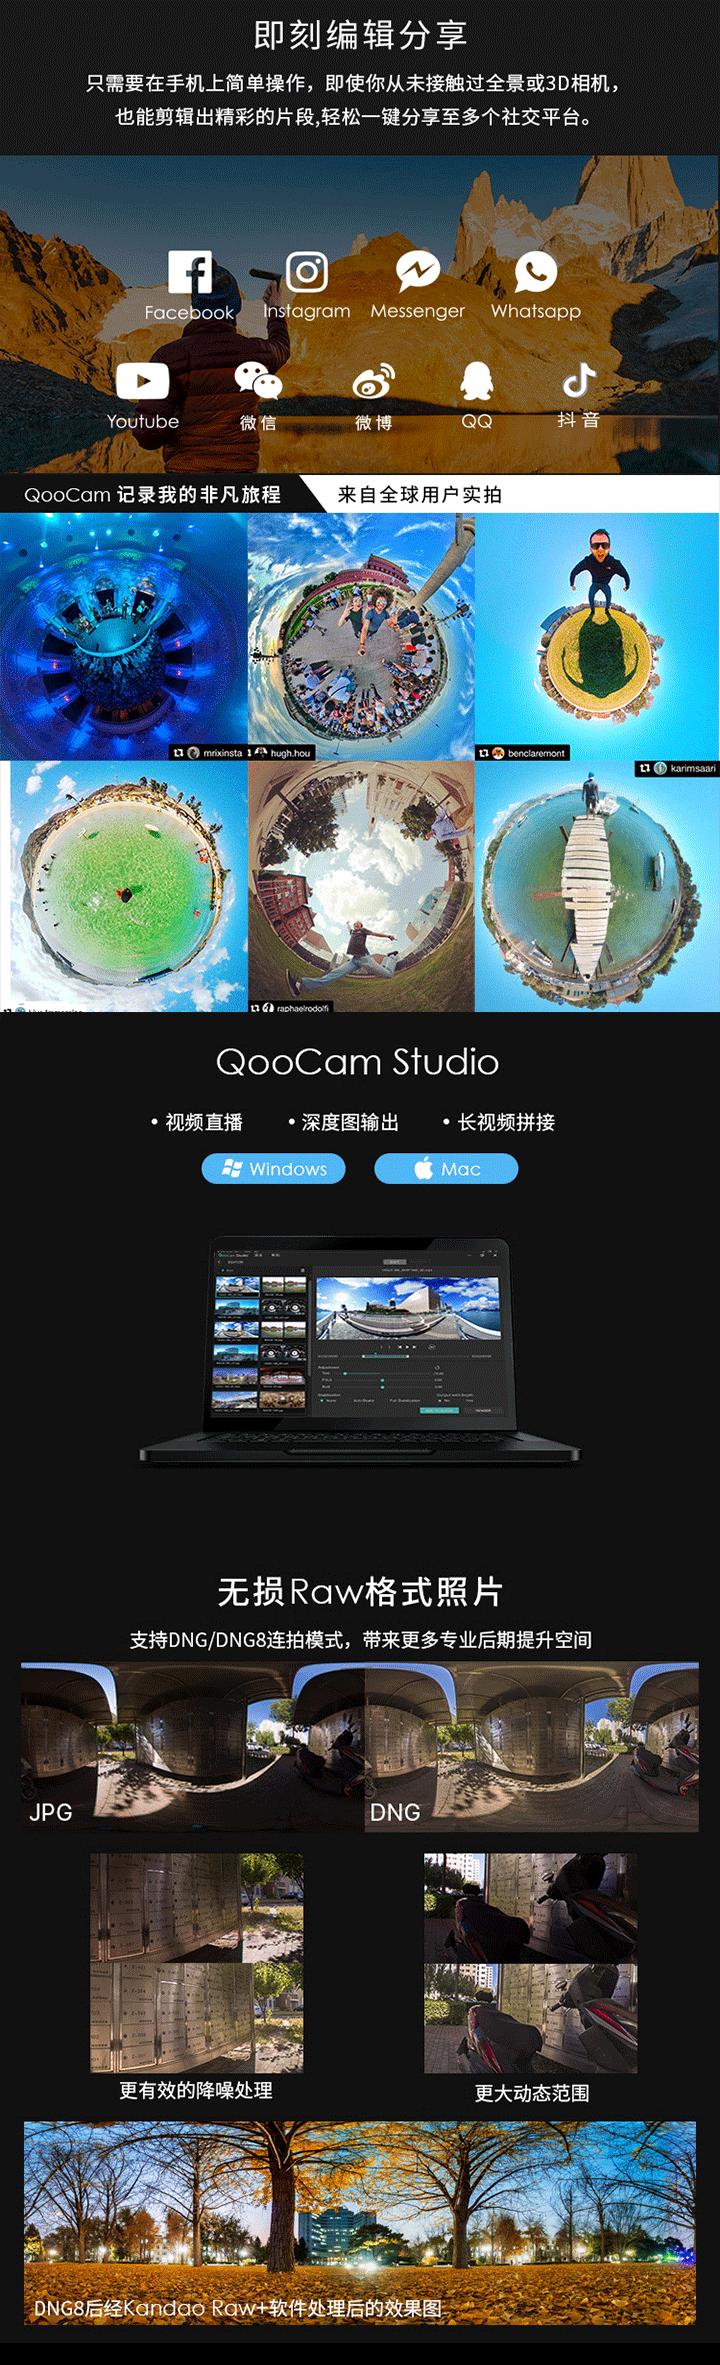 QooCam 3D/全景旅拍相机免费试用,评测